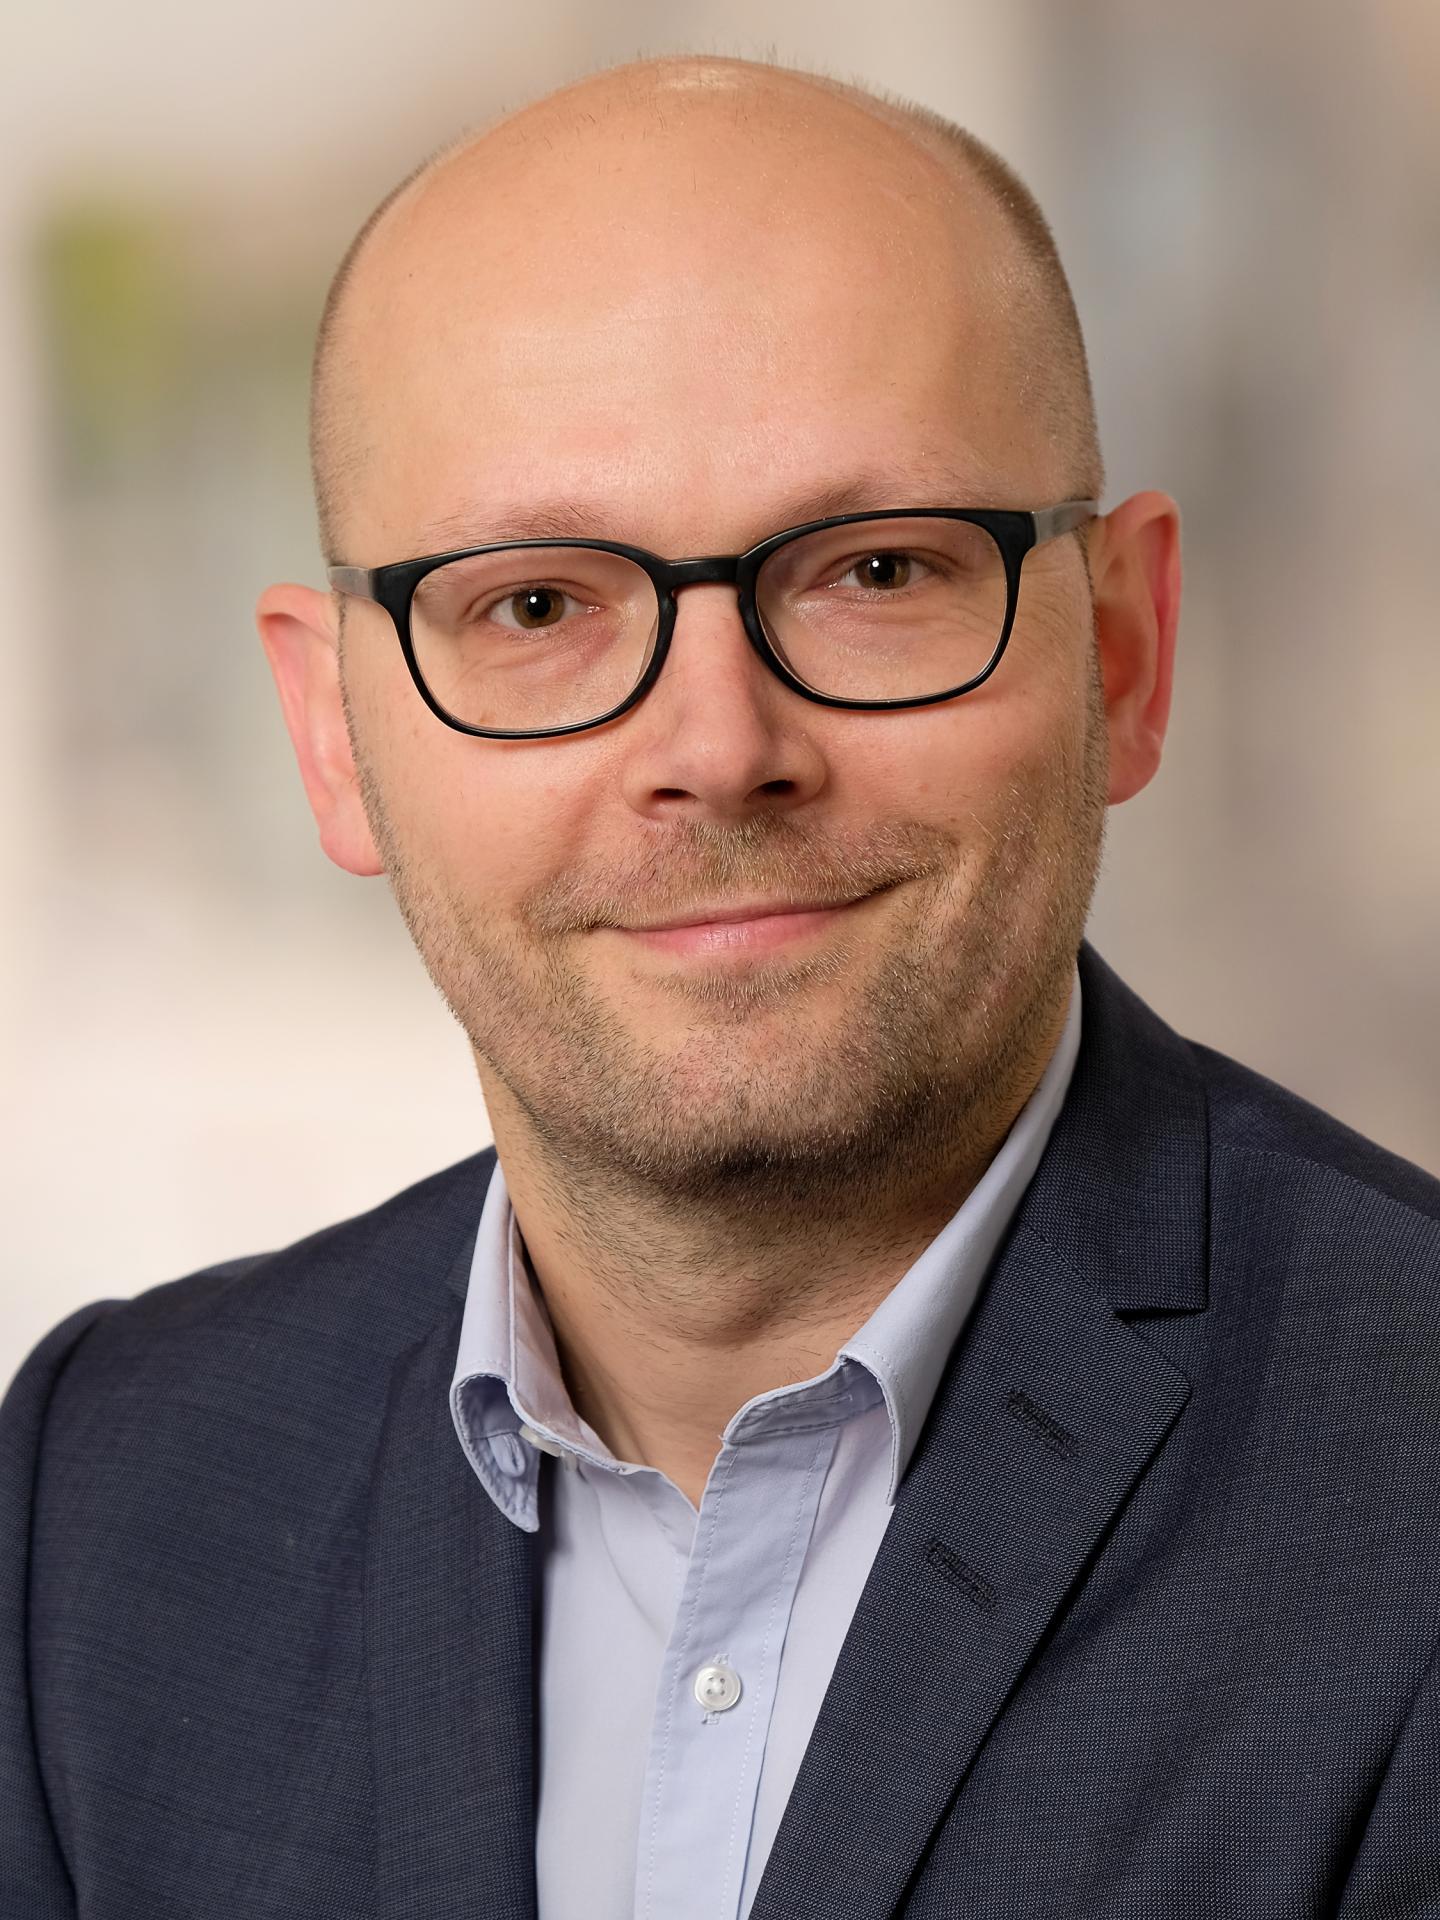 1. Bürgermeister Michael Bayer